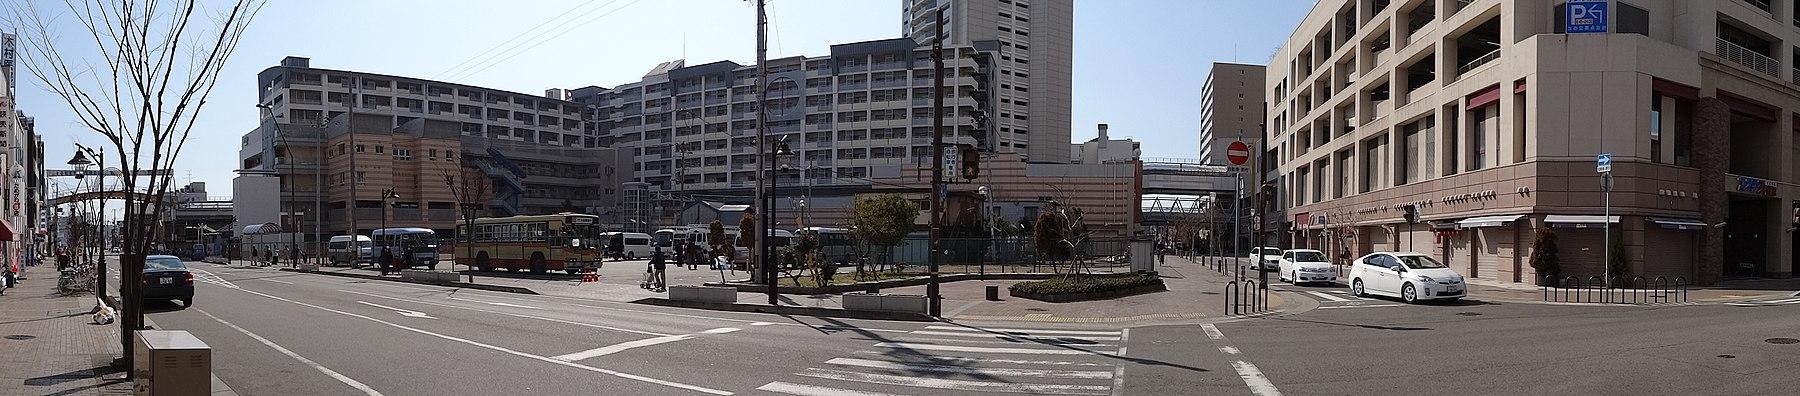 長田区街景 - panoramio.jpg